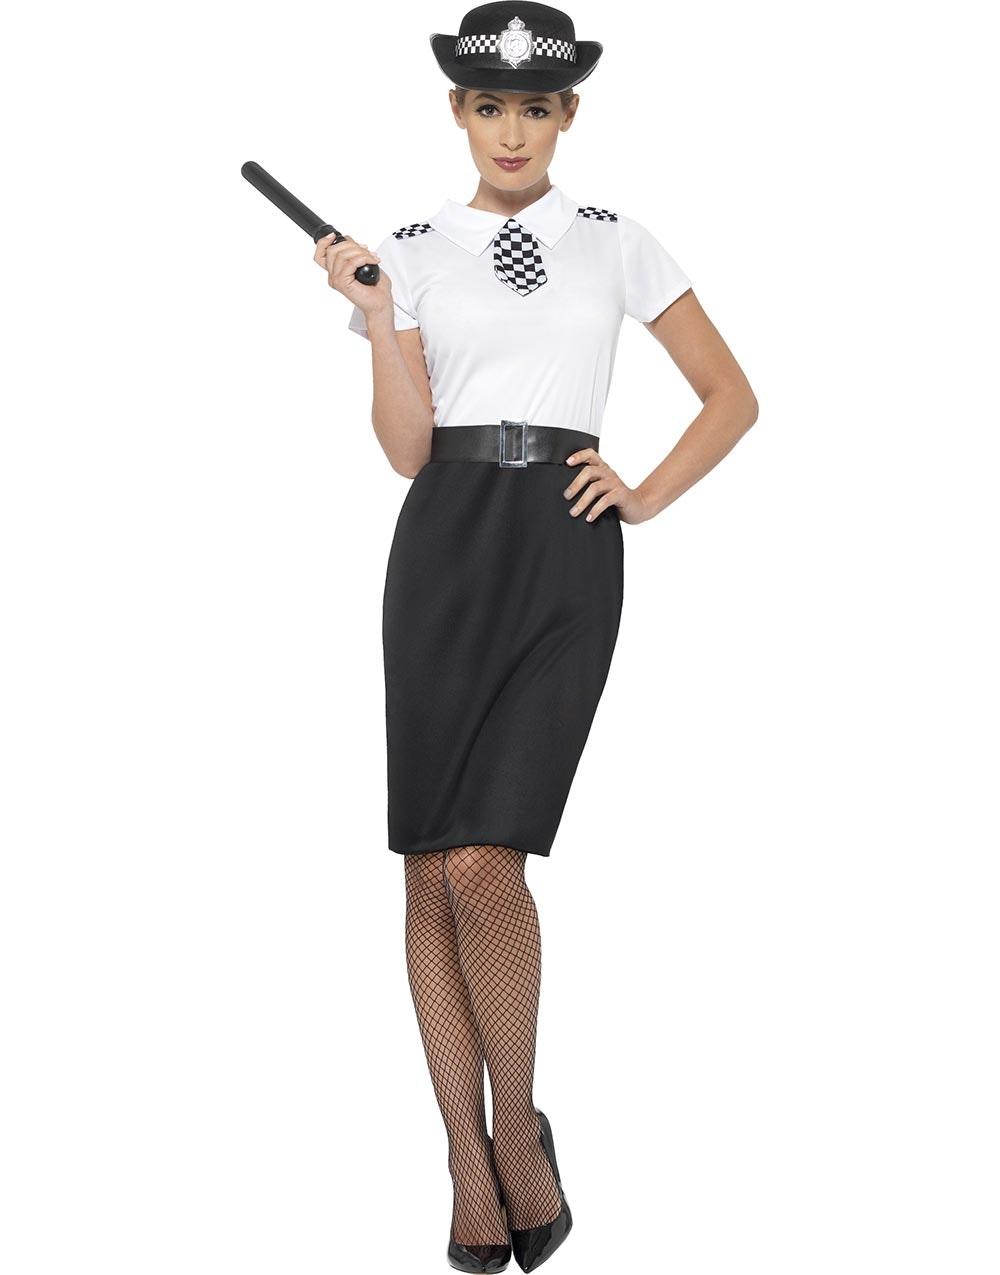 politi kostyme dame latex anal